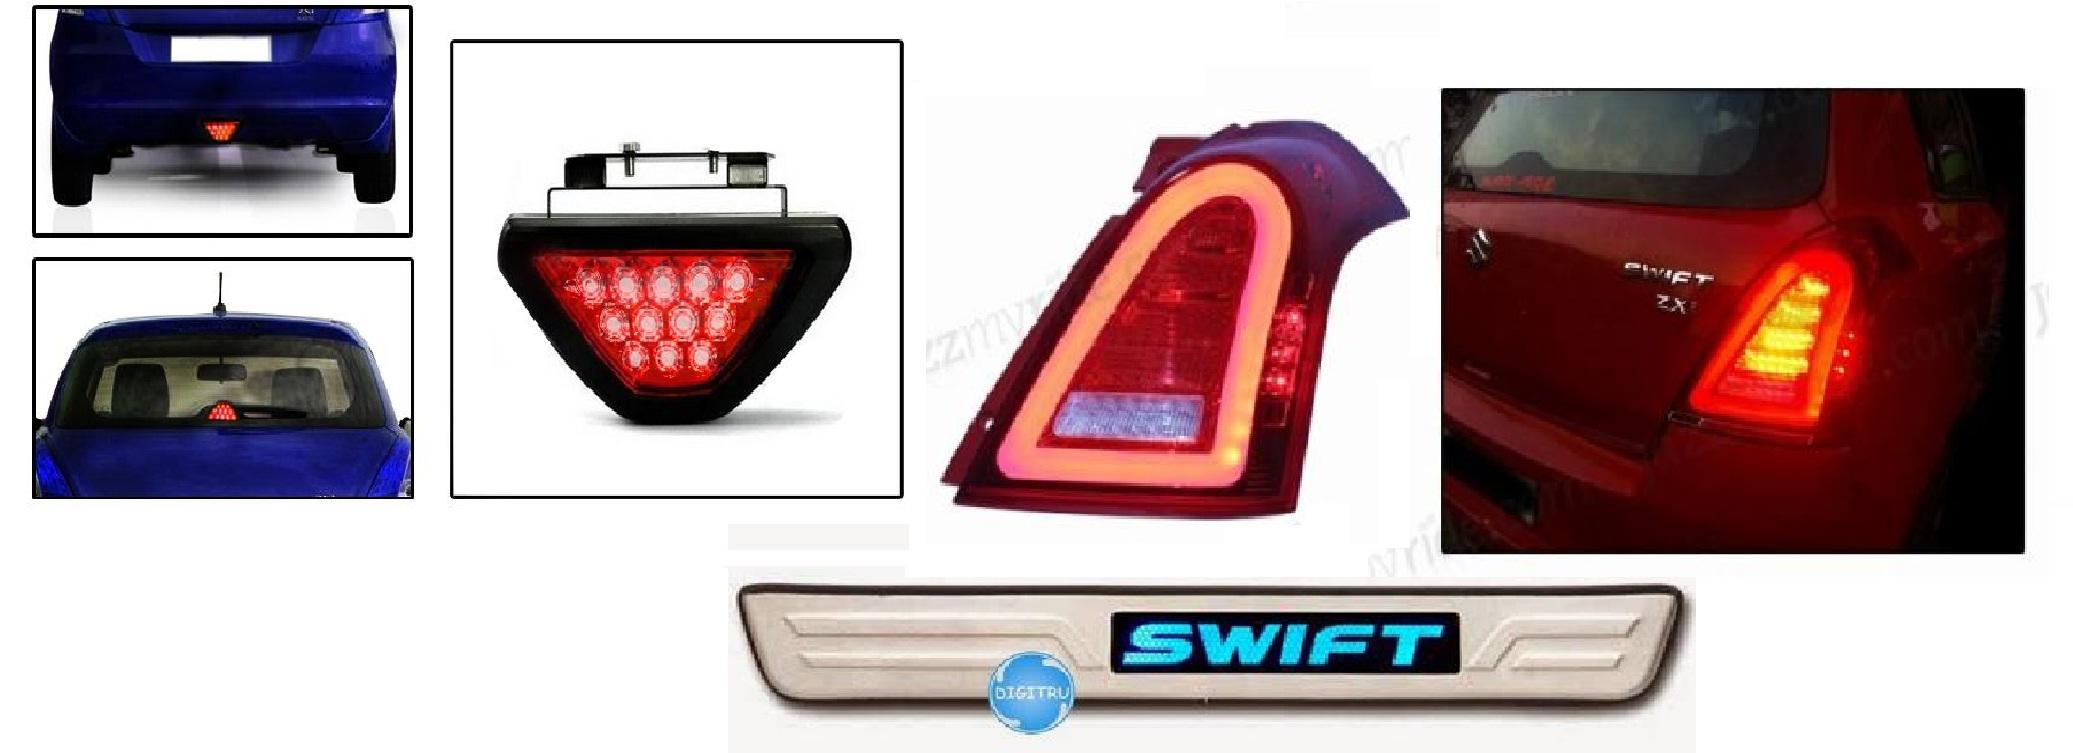 Car parking stickers design india - Led Lights Swift